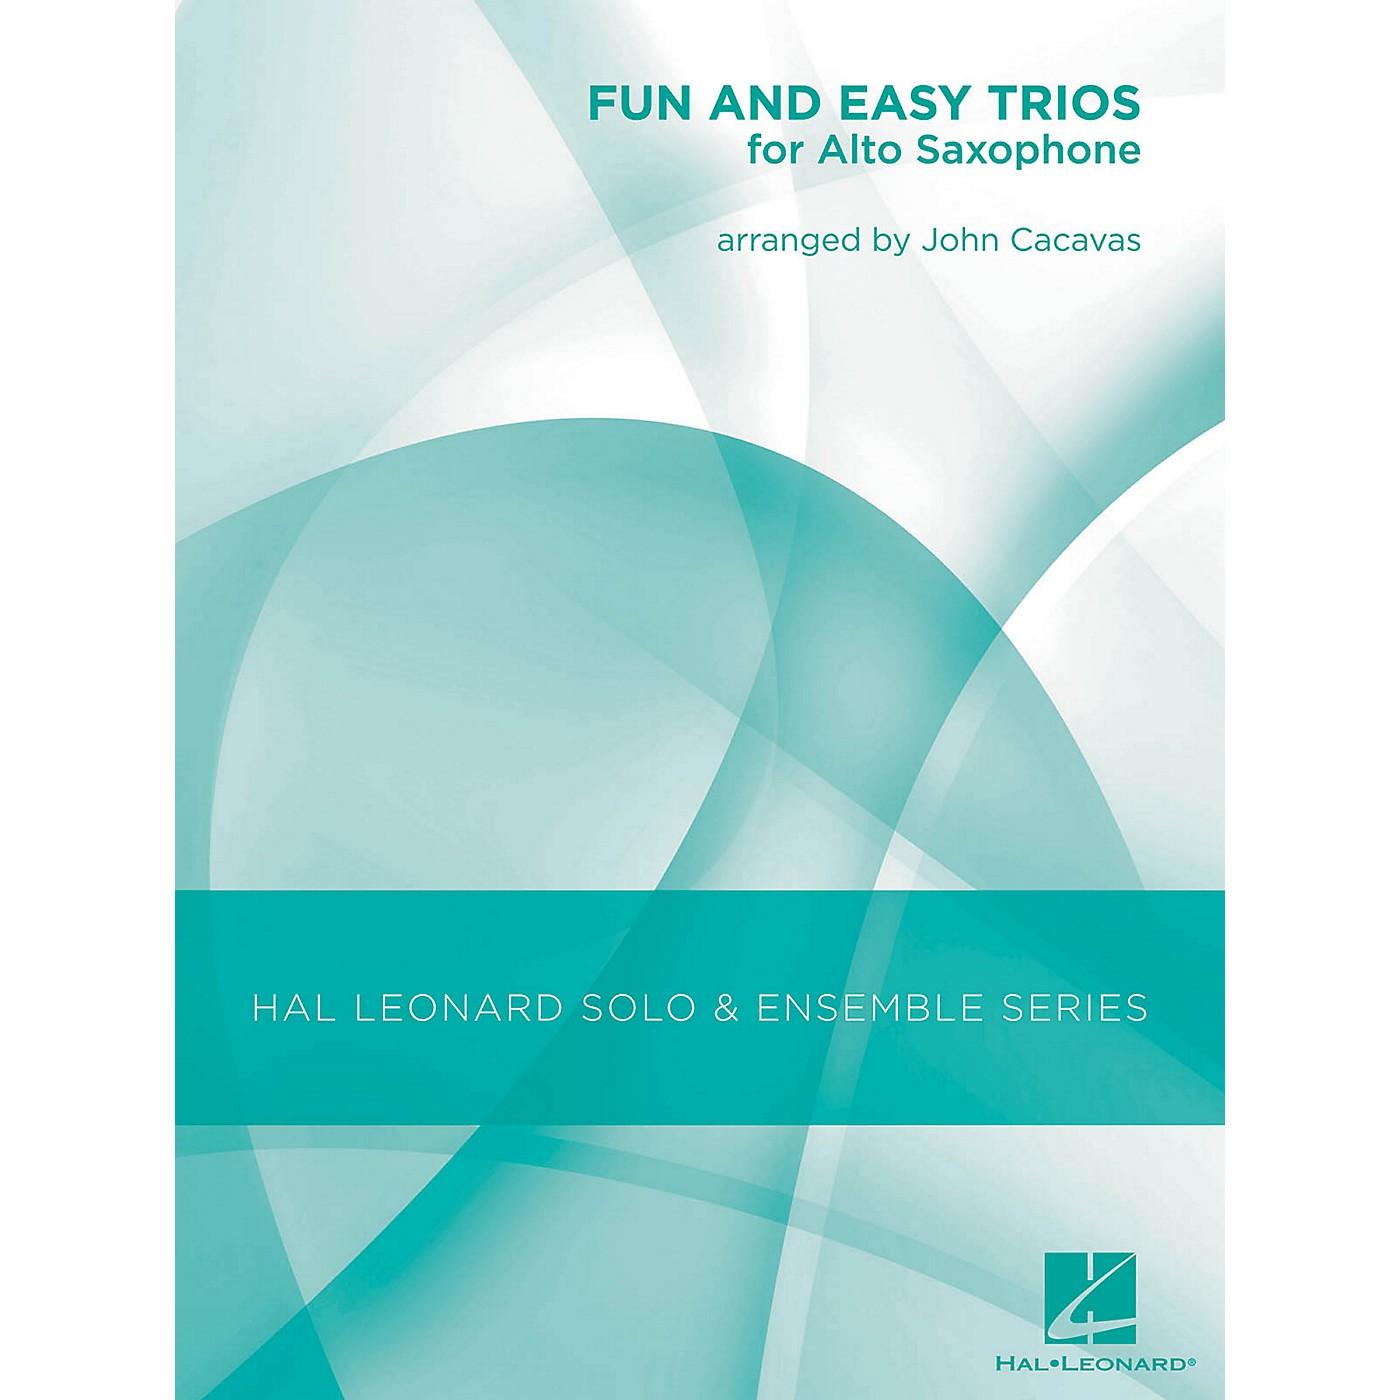 Hal Leonard Fun & Easy Trios for Alto Sax - Hal Leonard Solo & Ensemble Series Arranged By John Cacavas thumbnail